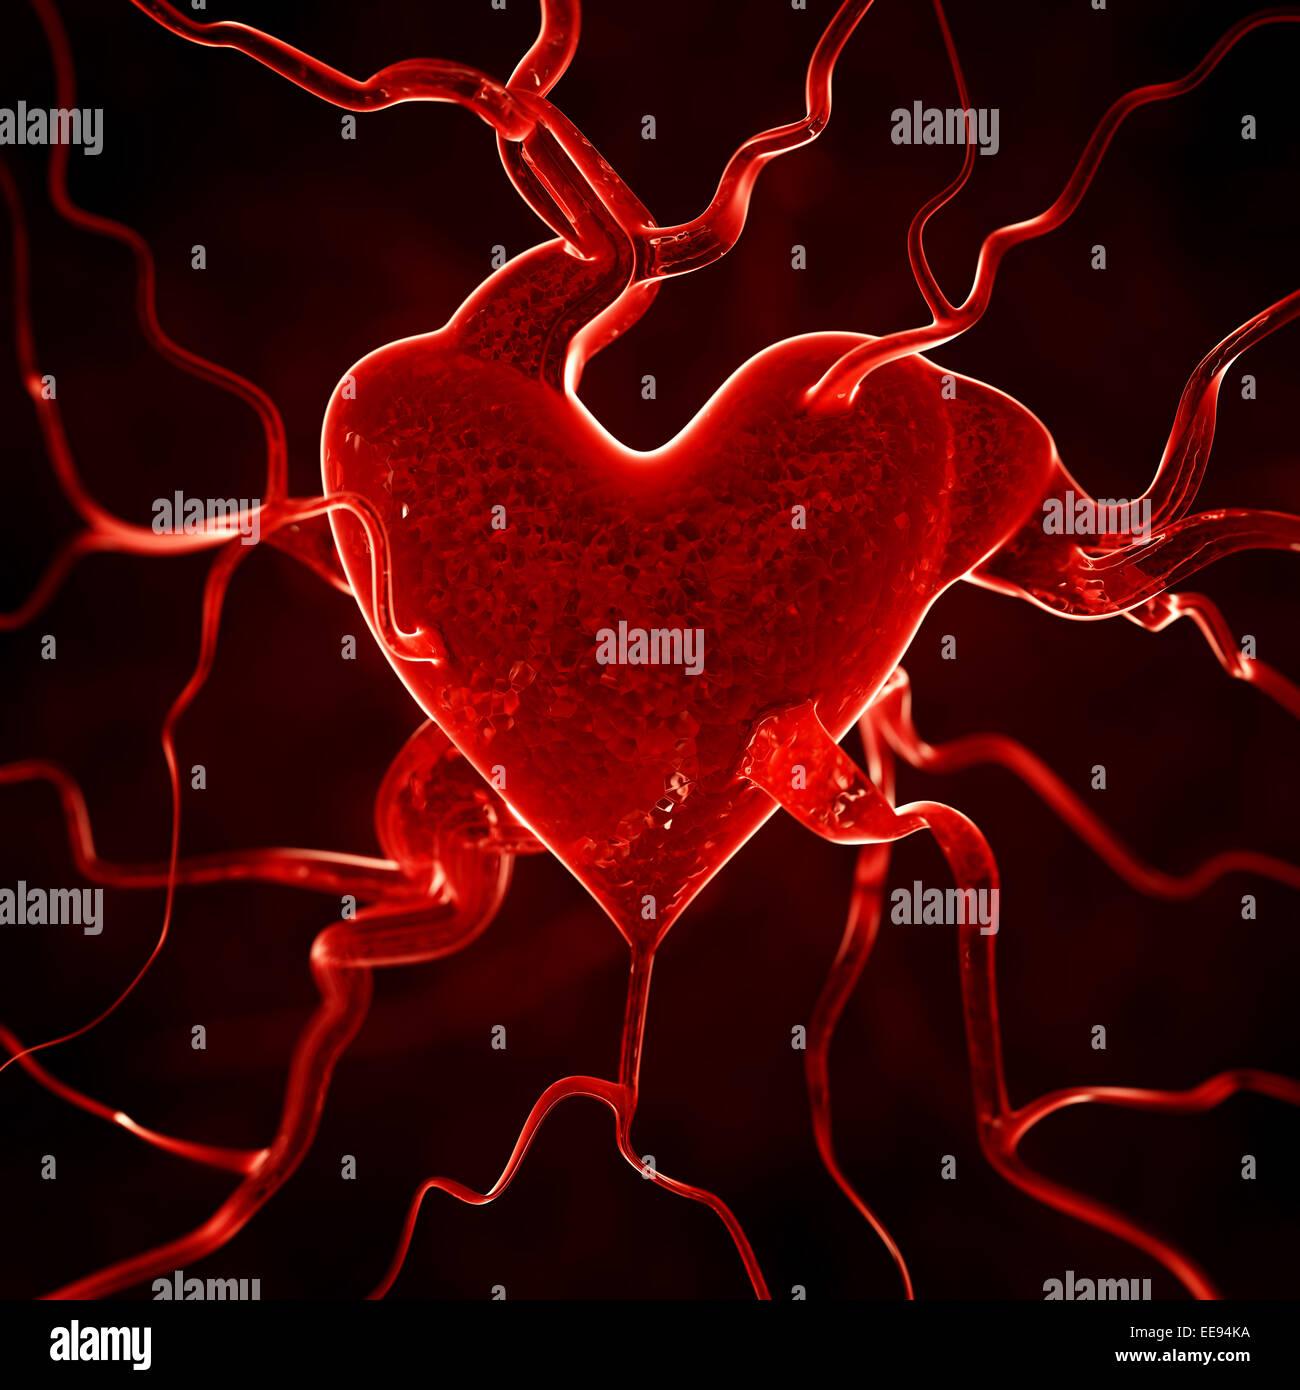 Heart background - Stock Image